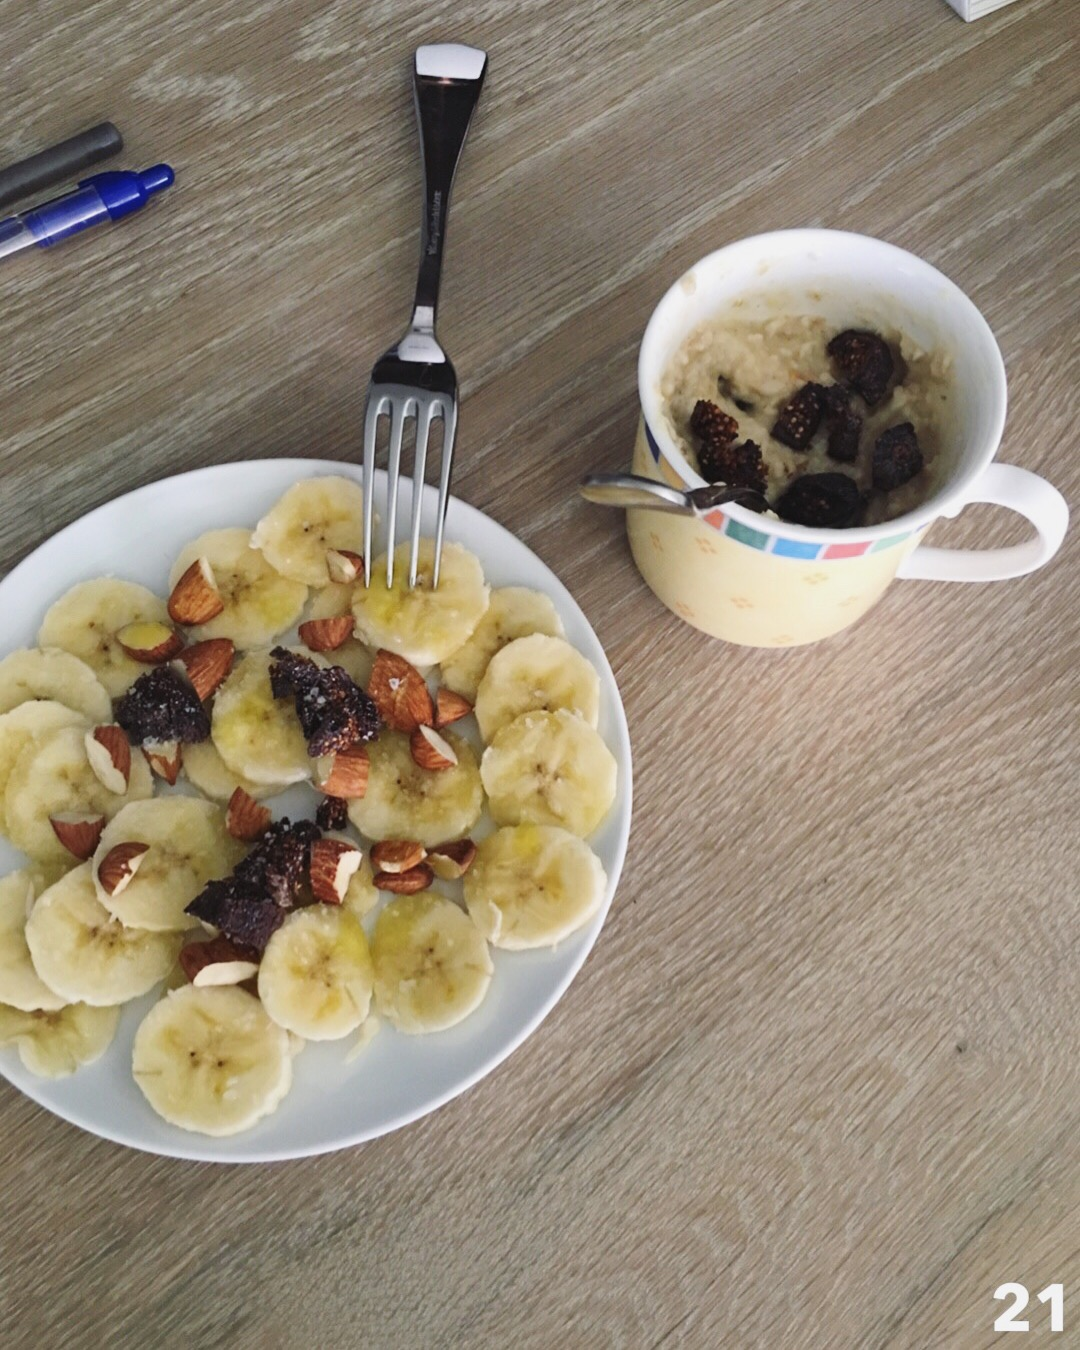 alyonka larionov eating disorder